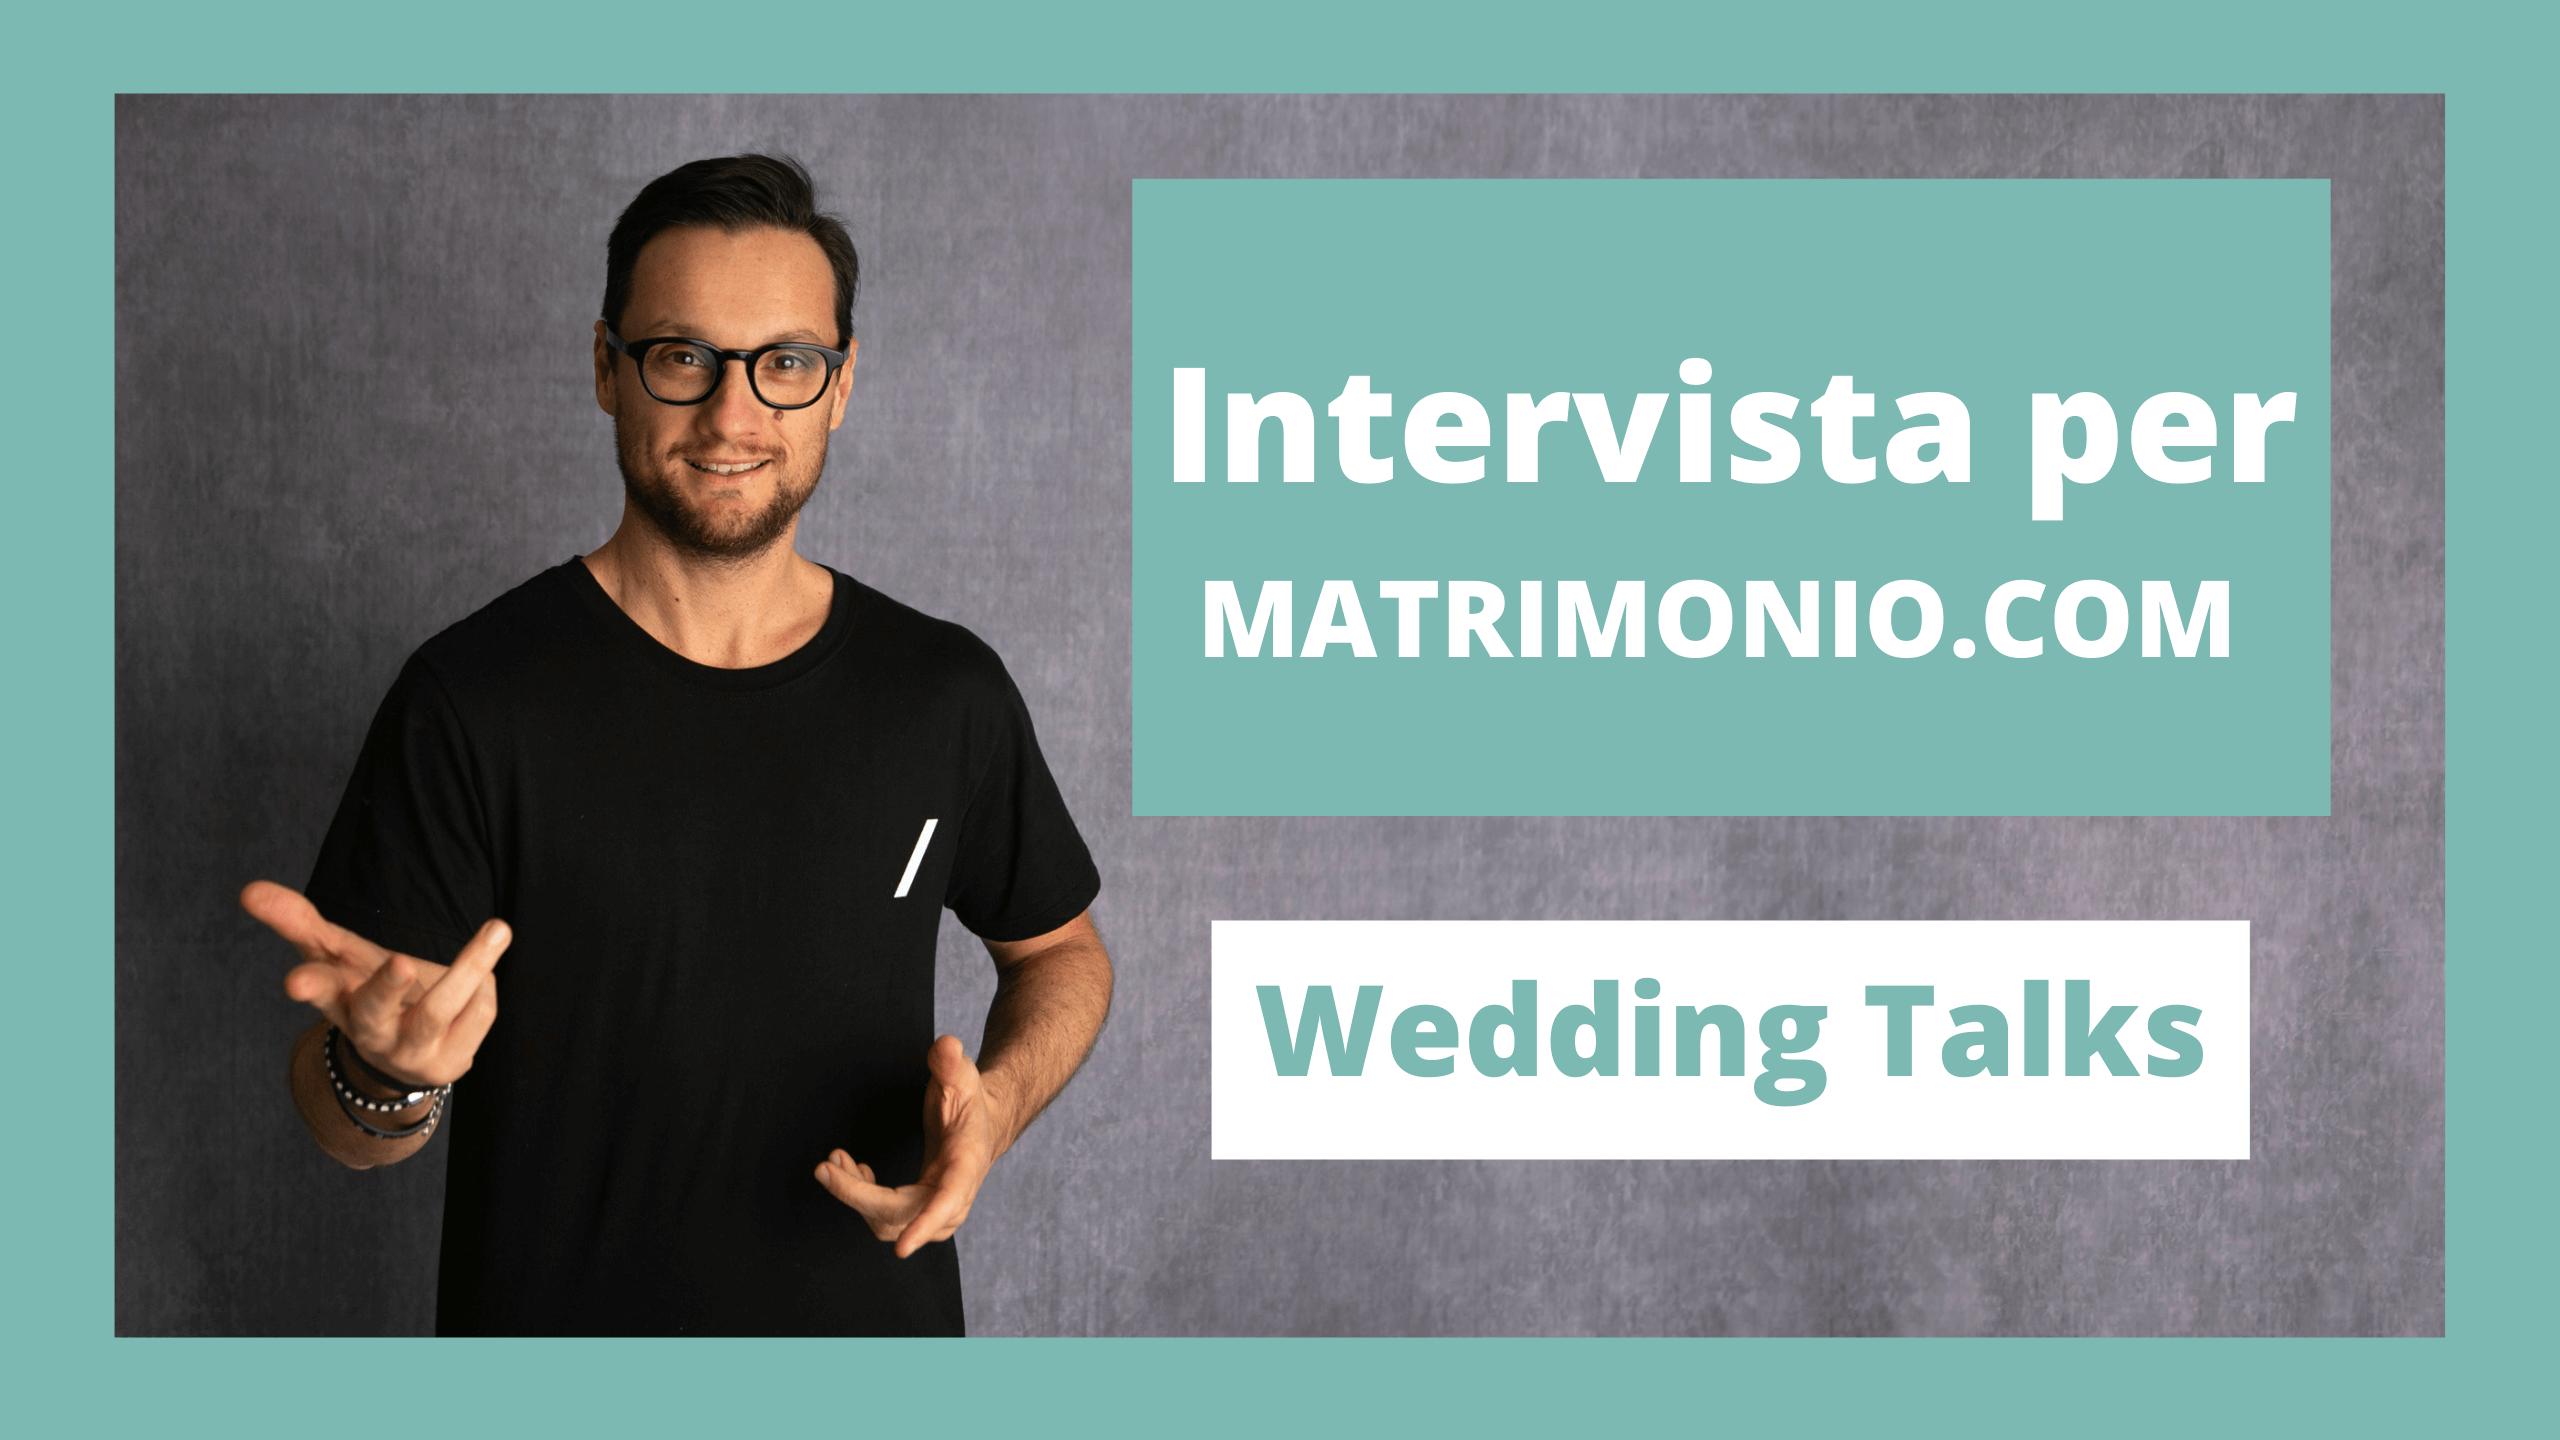 intervista matrimonio.com